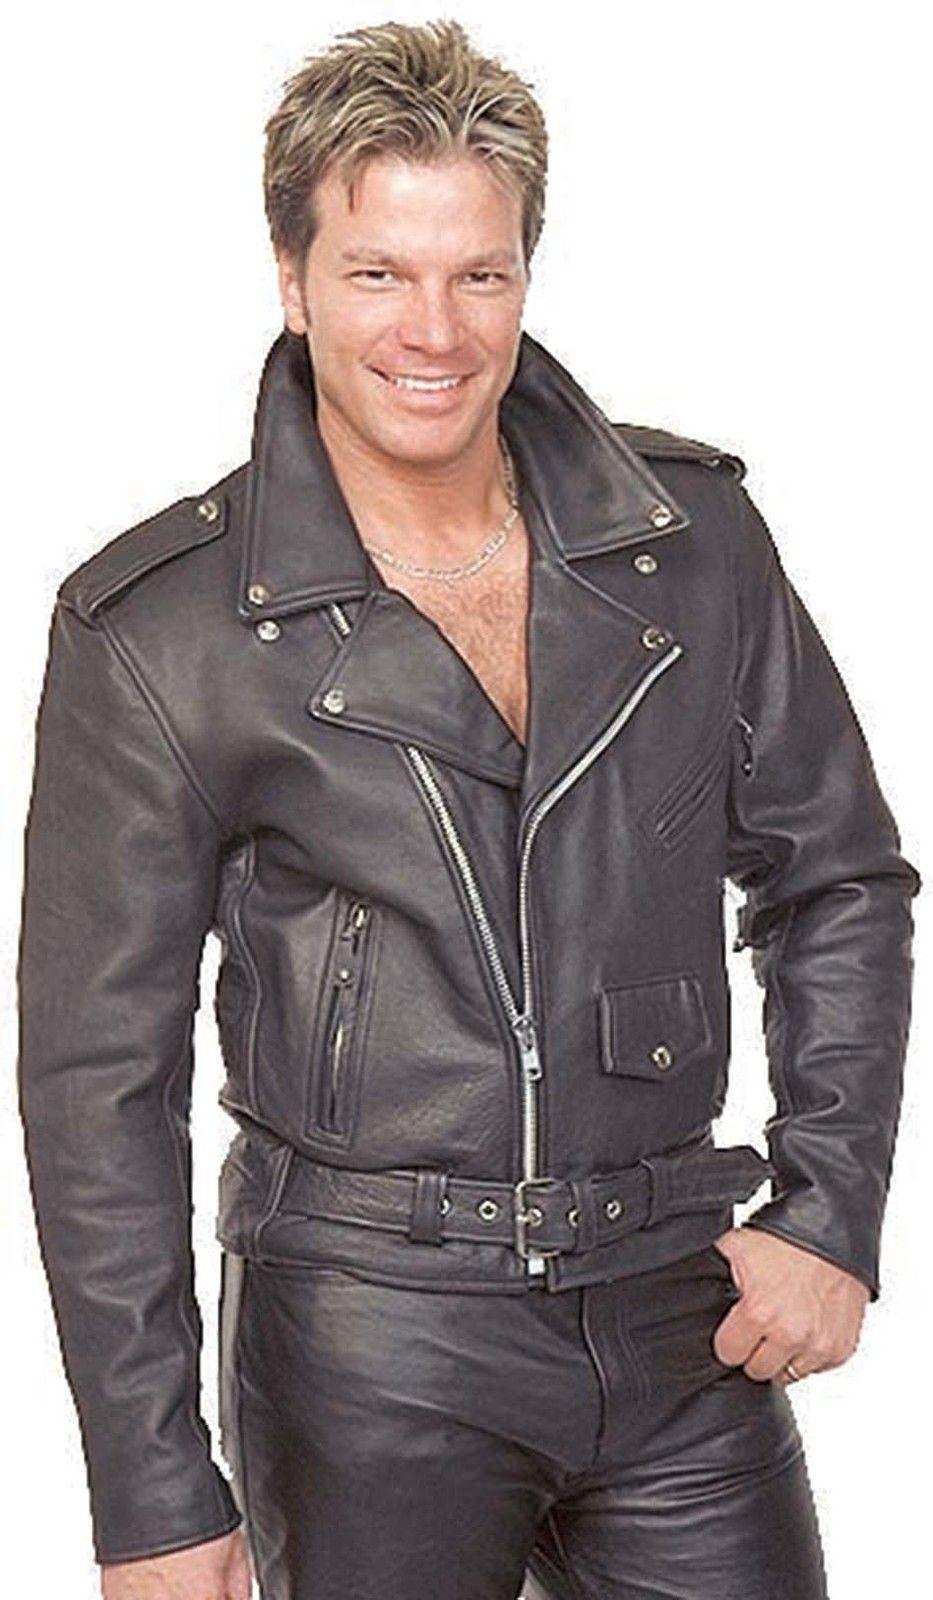 New Handmade Classic Leather Motorcycle Jacket For Men Blackleatherjacket Slimfitjacket Classicjac Motorcycle Jacket Mens Leather Jacket Leather Jacket Men [ 1600 x 933 Pixel ]